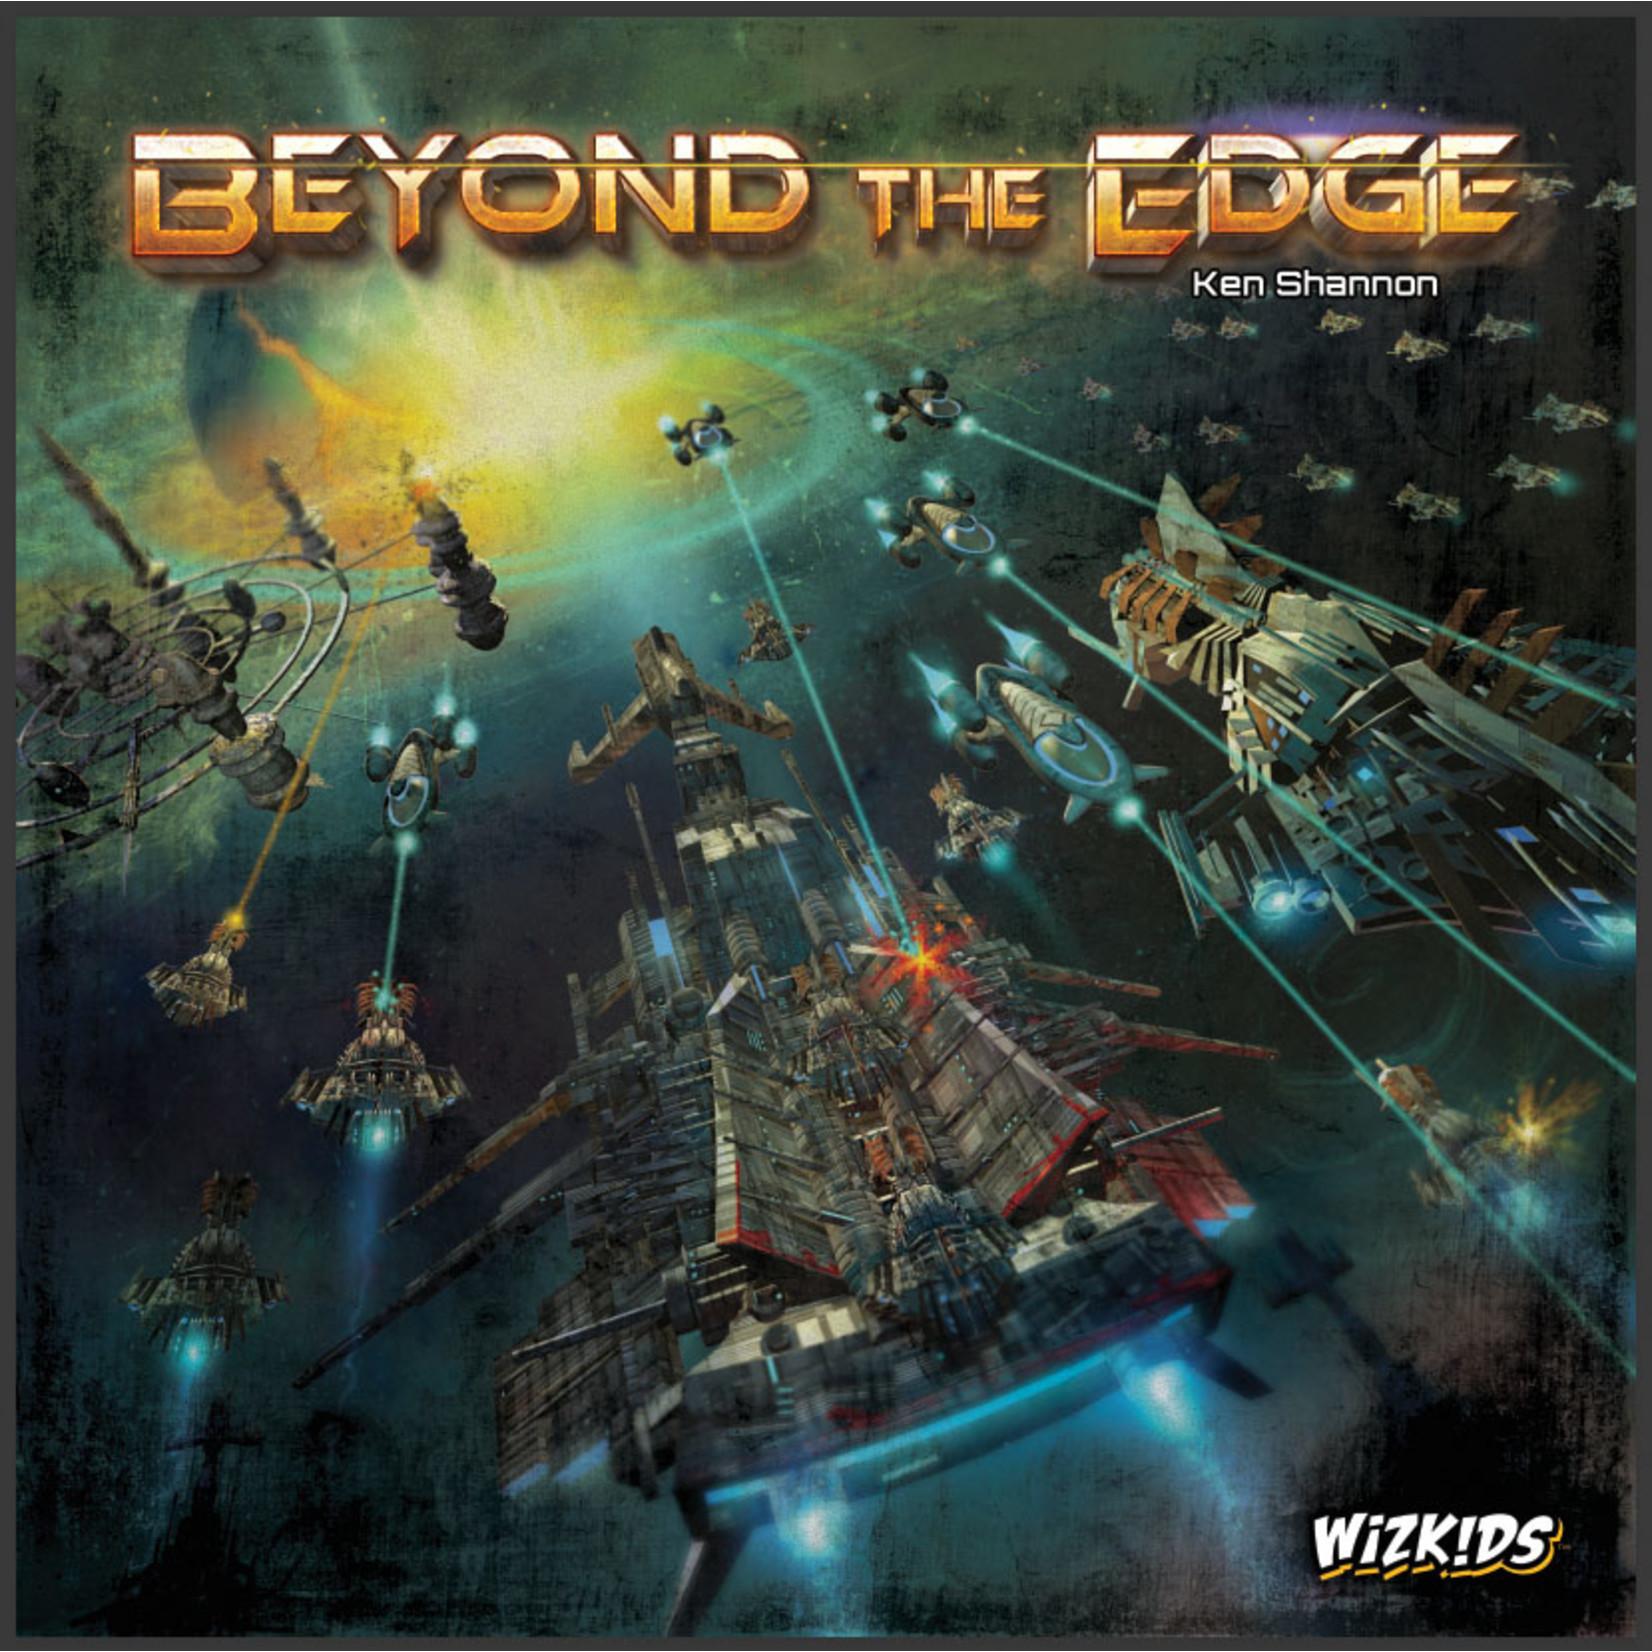 WIZKIDS/NECA Beyond the Edge